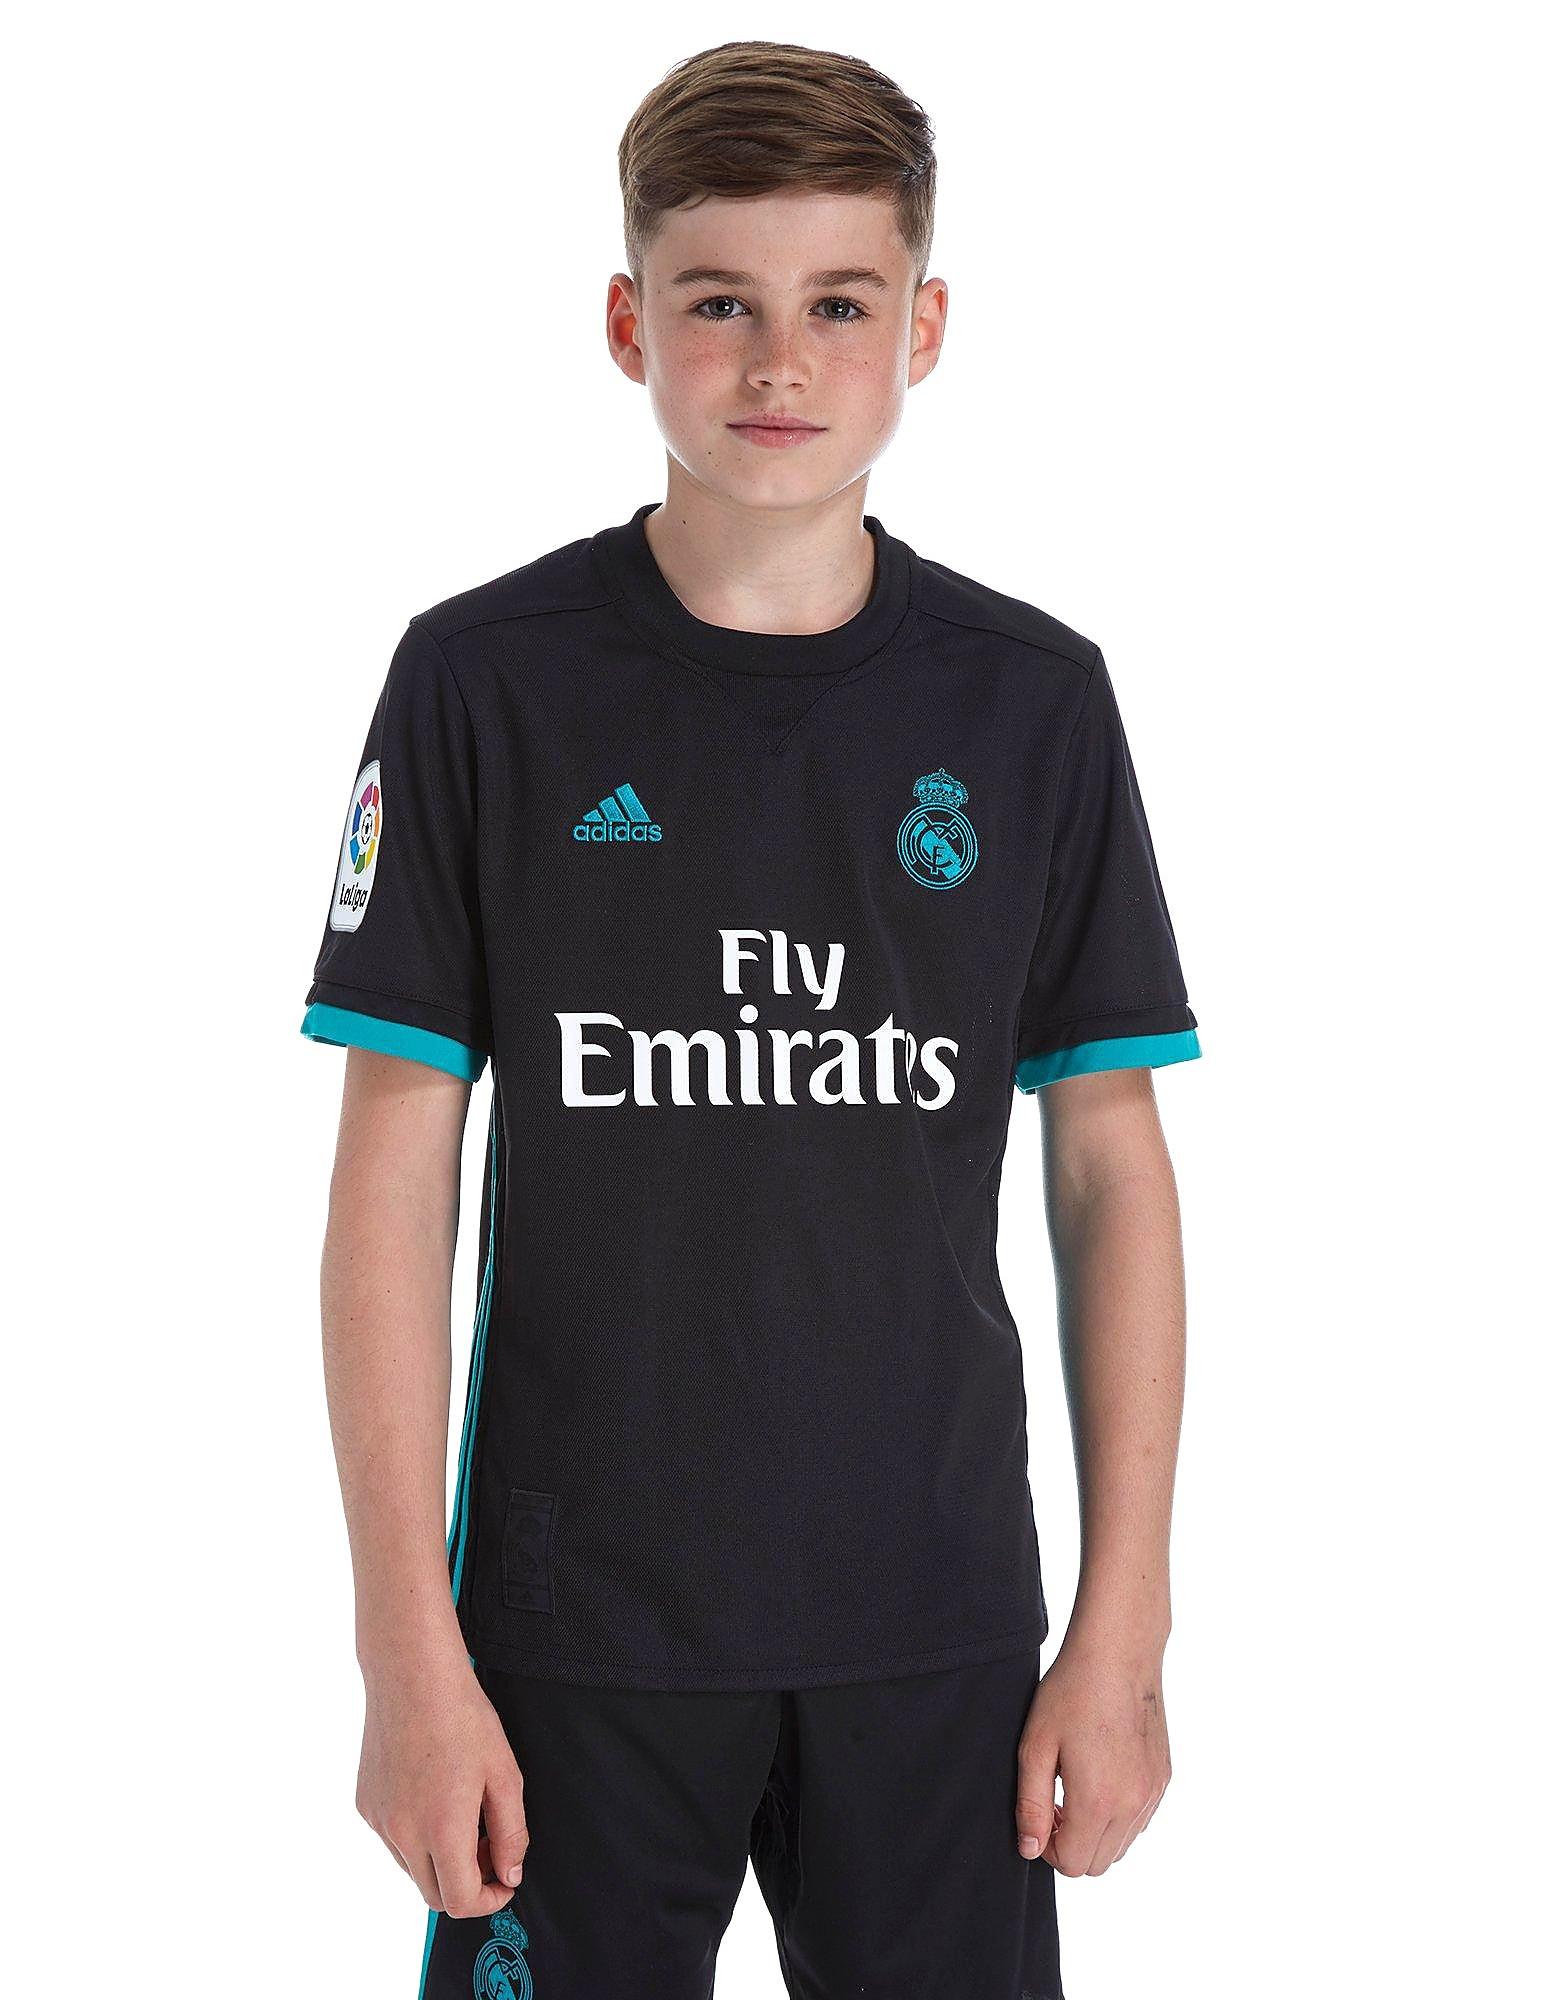 adidas Maillot Real Madrid 2017/18 Extérieur Junior